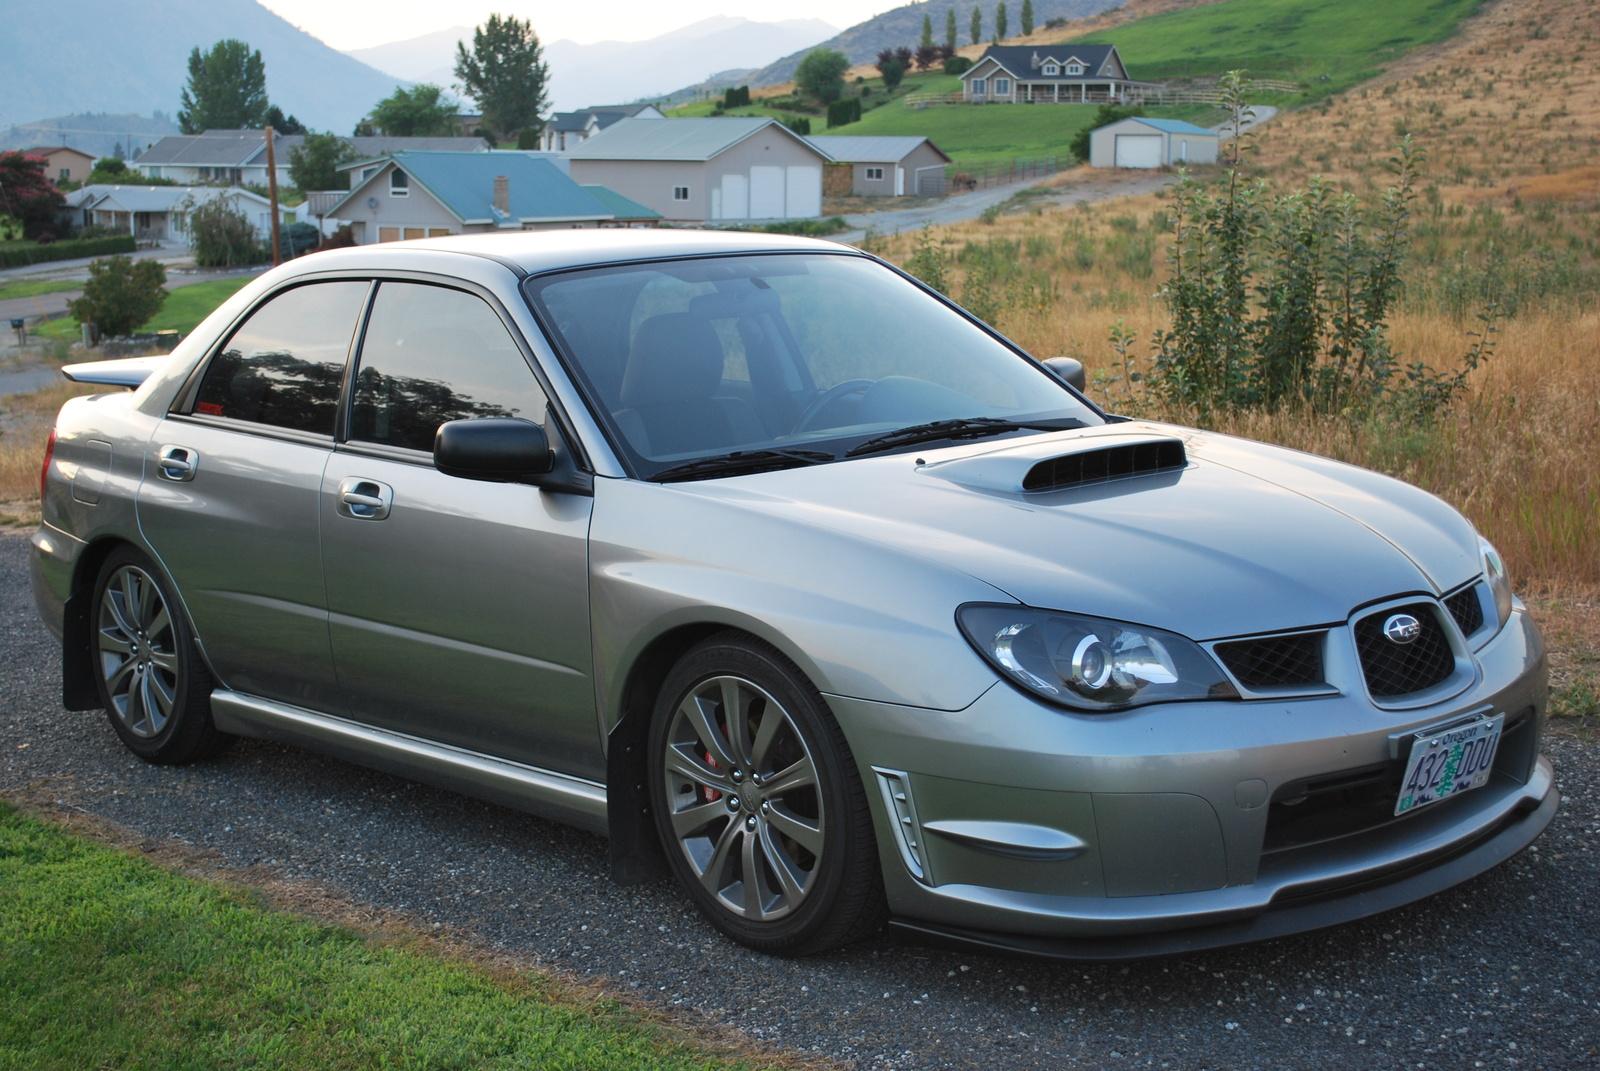 2007 Subaru Impreza Image 14